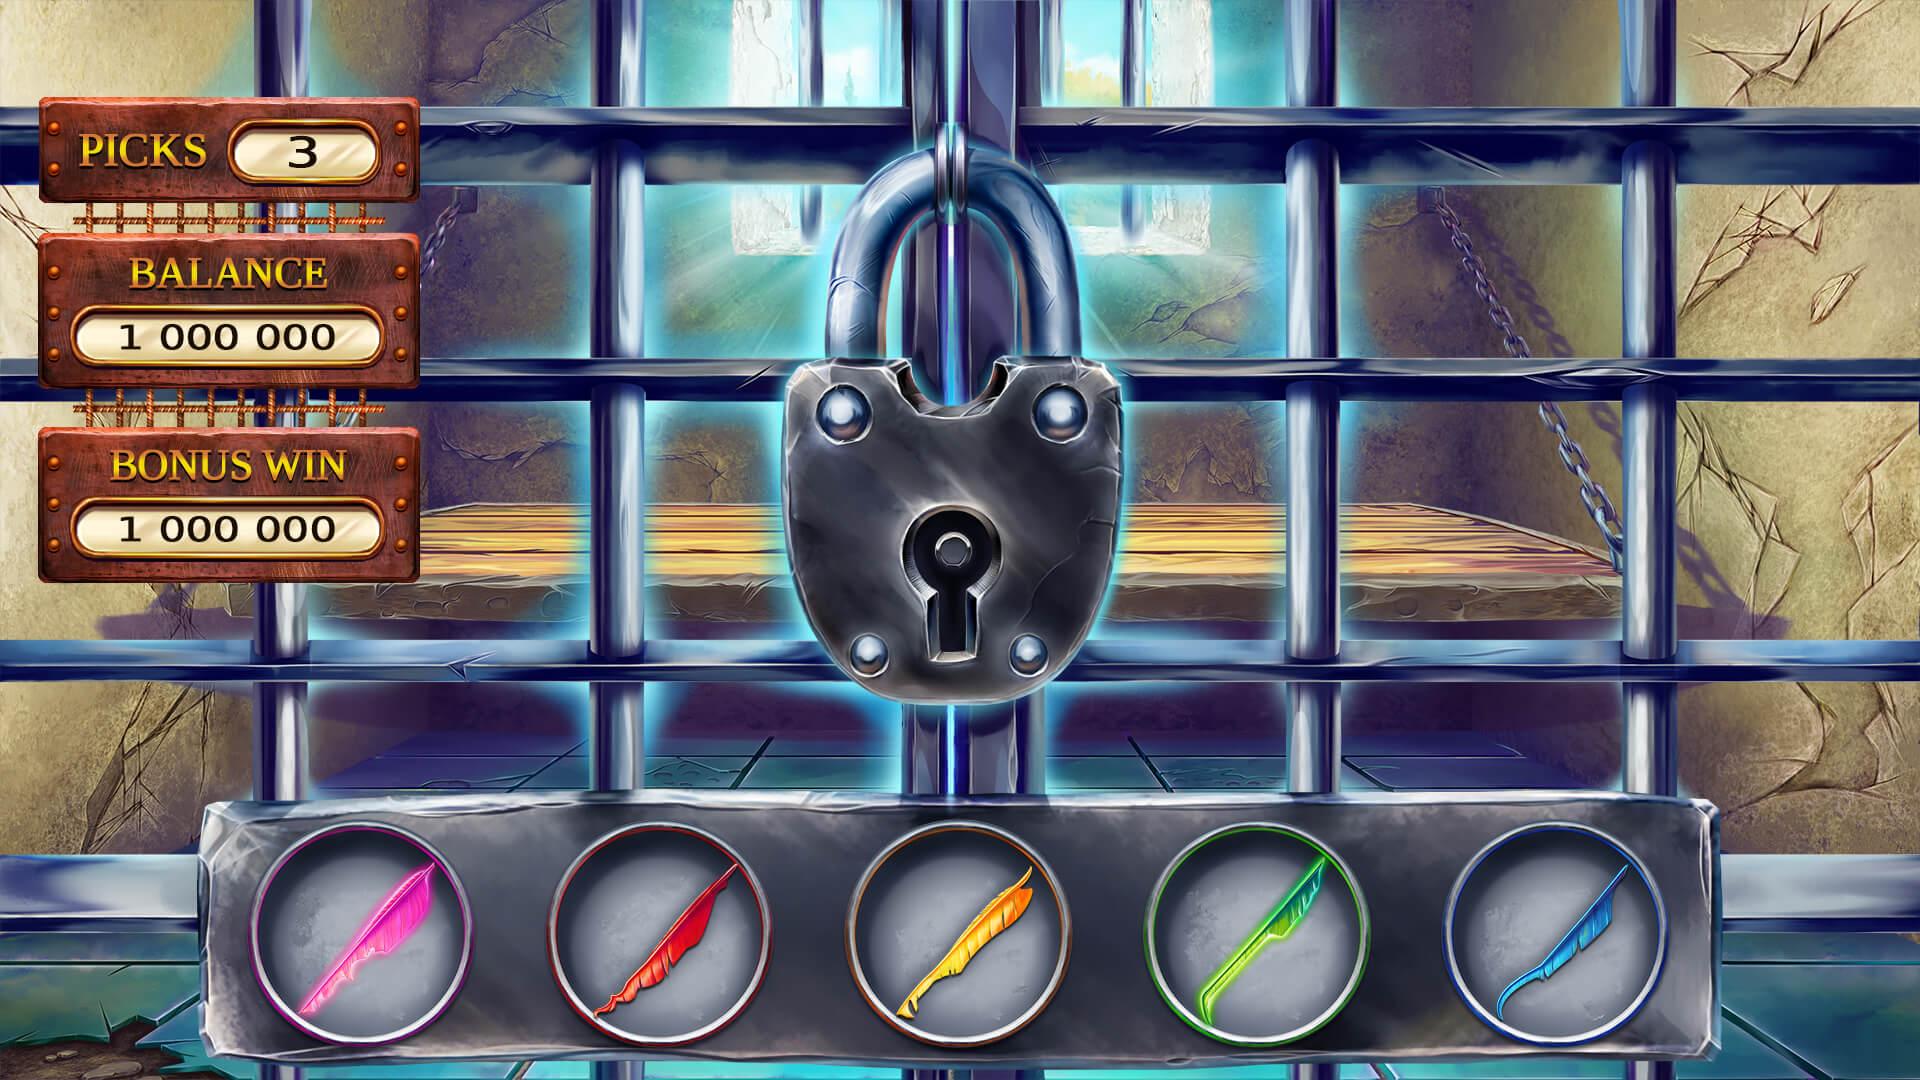 prison_bonus_game